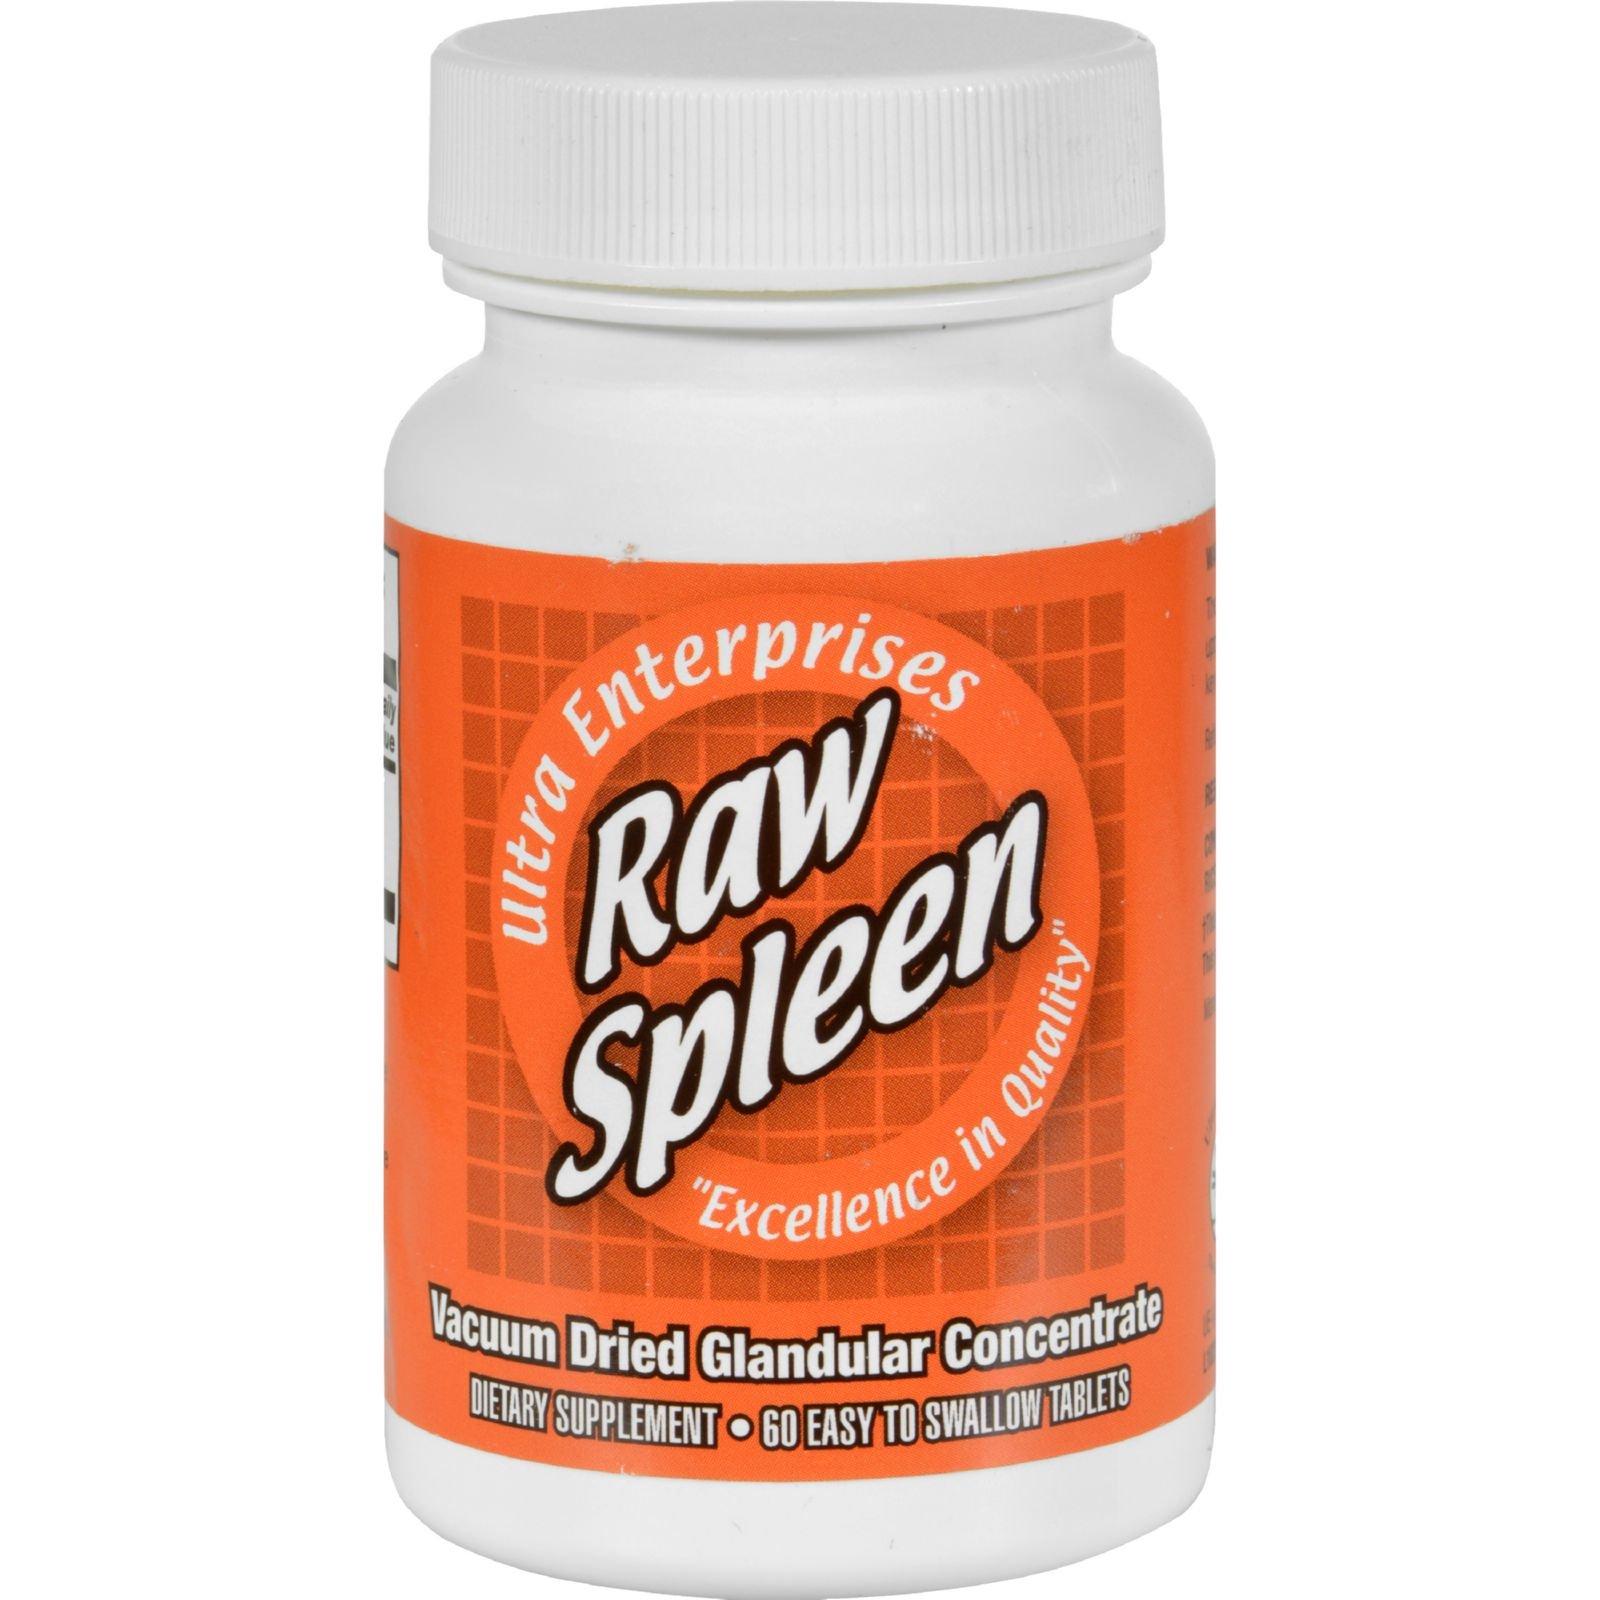 Ultra Glandulars Raw Spleen - Vacuum Dried Glandular Concentrate - 200 mg - 60 Tablets (Pack of 2) by Ultra Glandulars